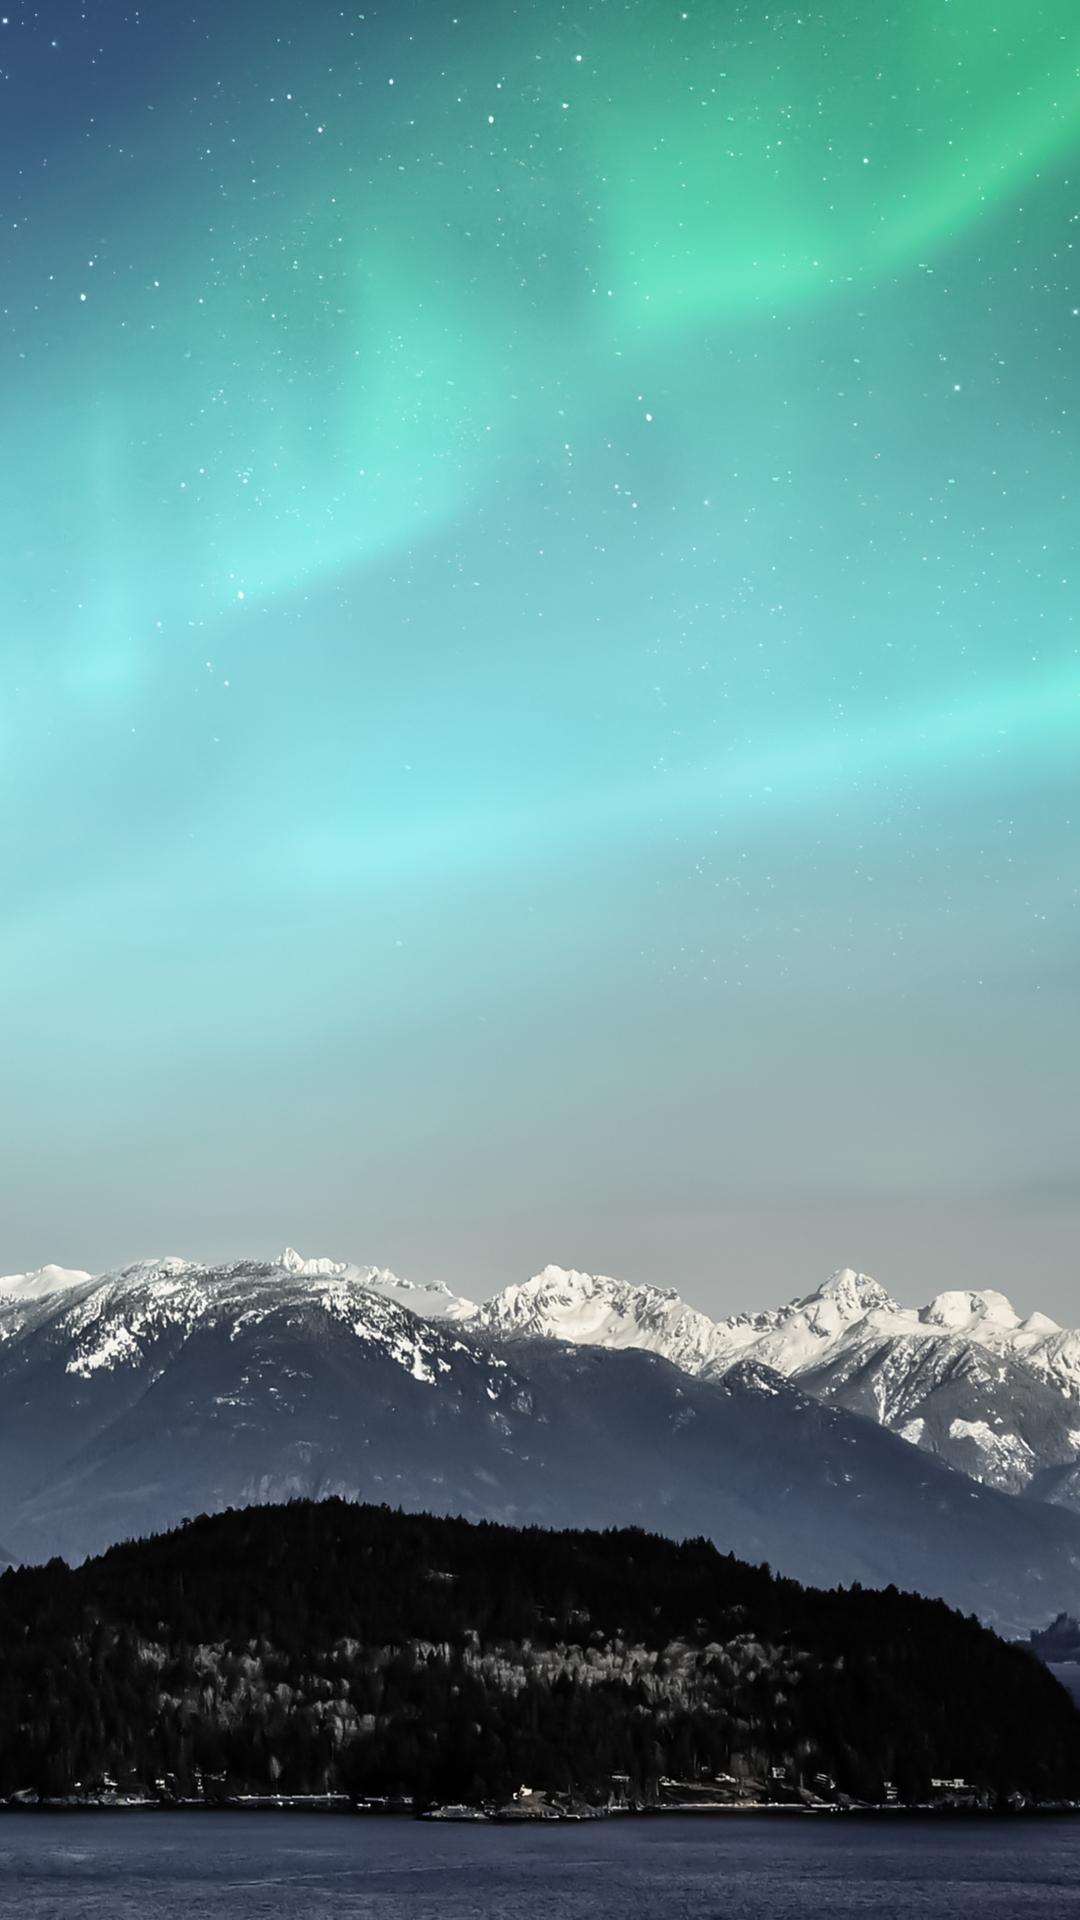 earth/aurora borealis (1080x1920) wallpaper id: 613518 - mobile abyss